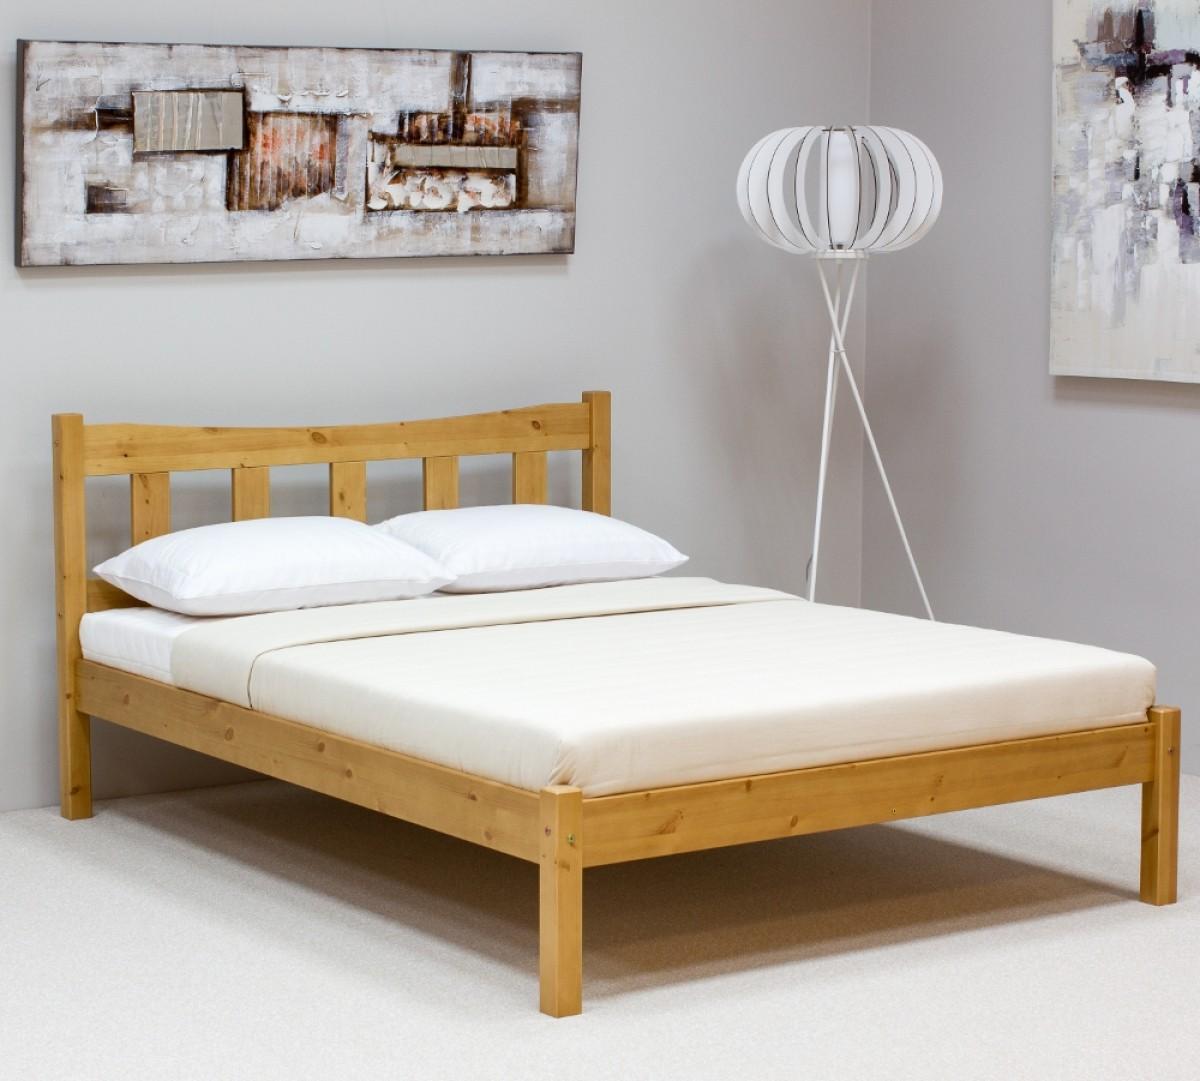 Poppy Antique Pine Wooden Bed